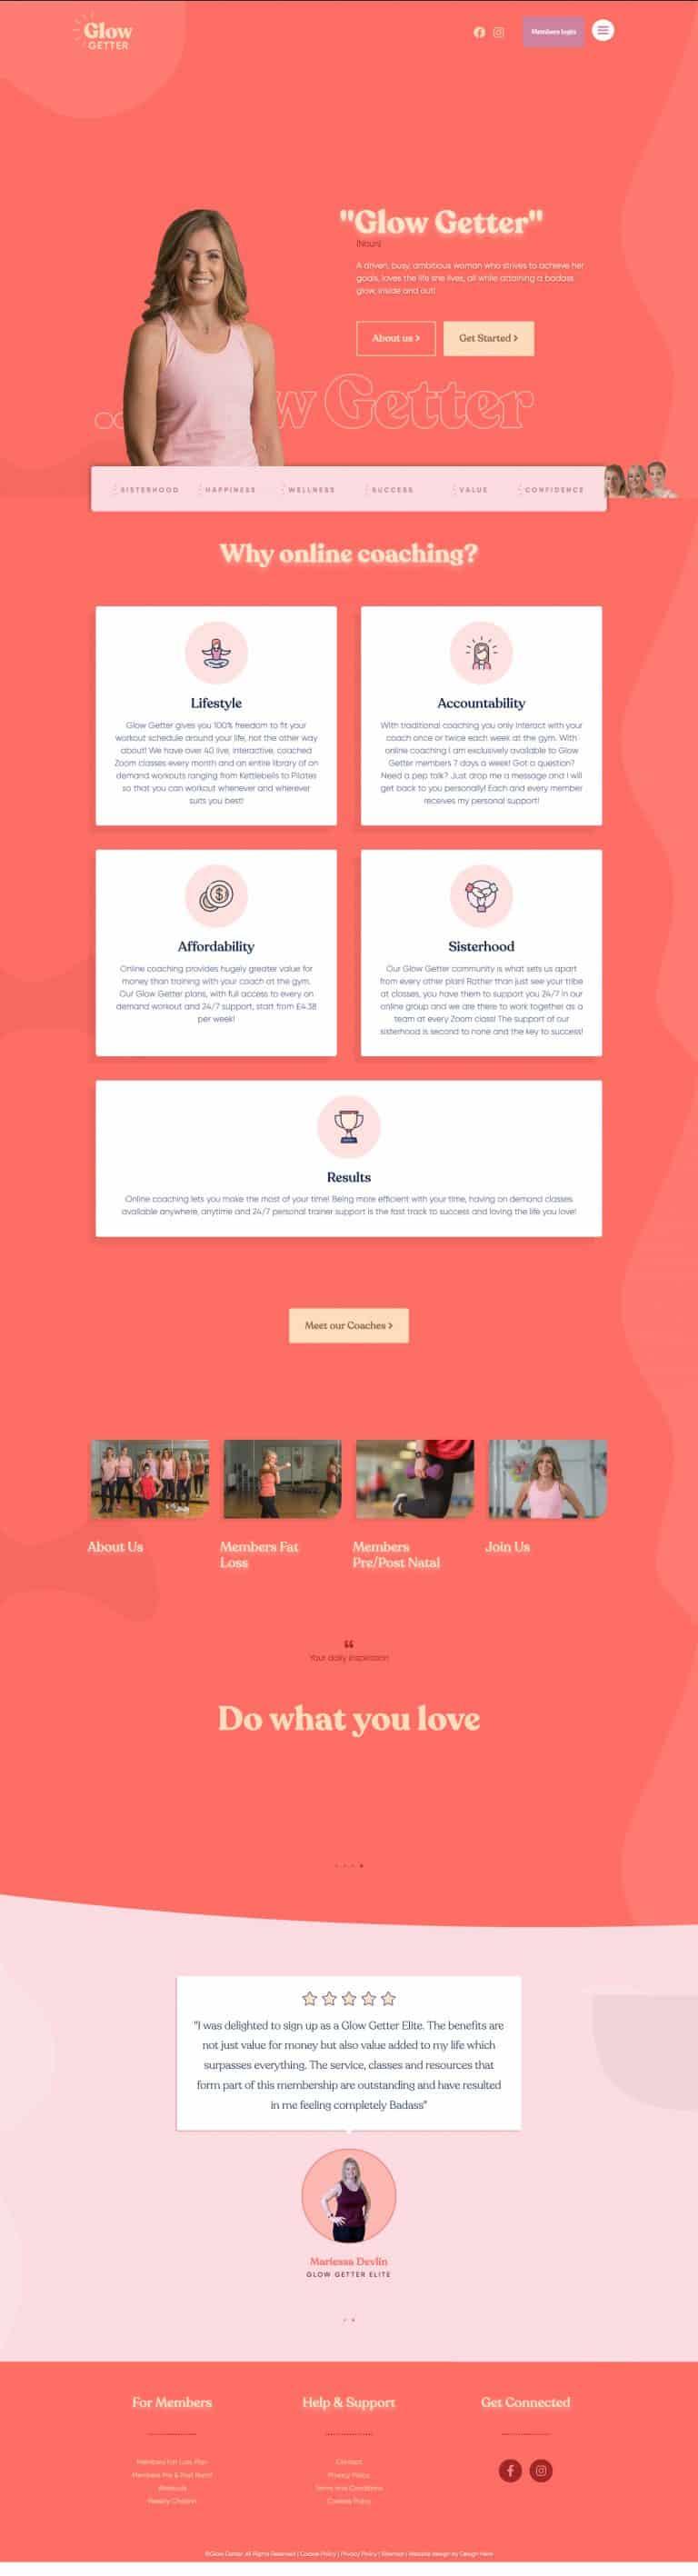 membership website design for Greenock Coaching business